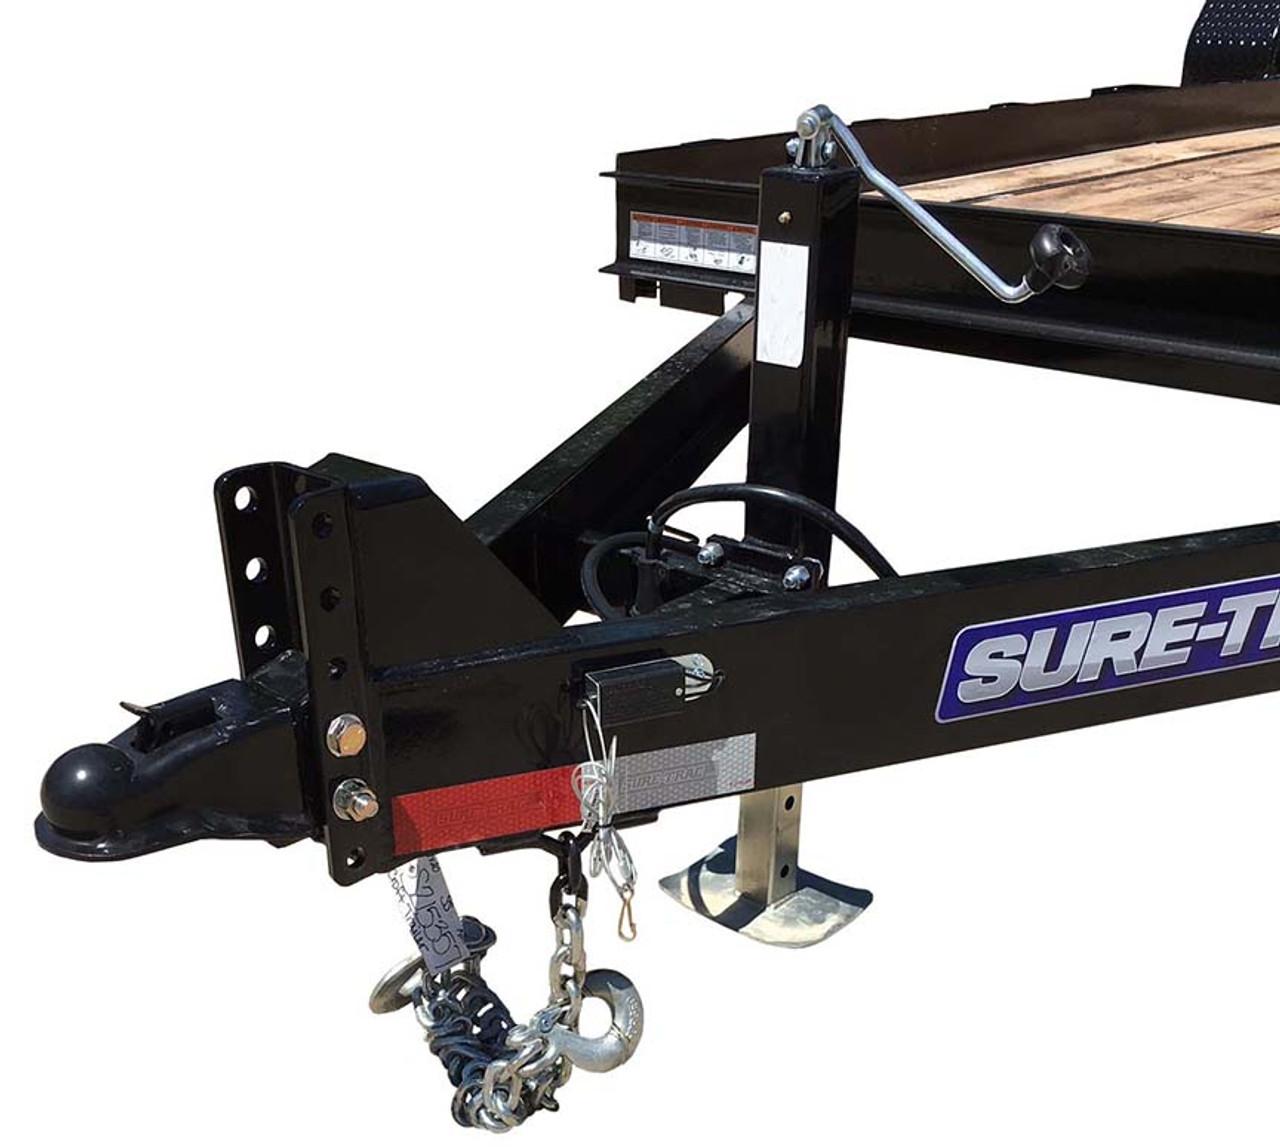 "STSK8016TA5 --- 79"" x 16' Low Profile Skid Steer Trailer"